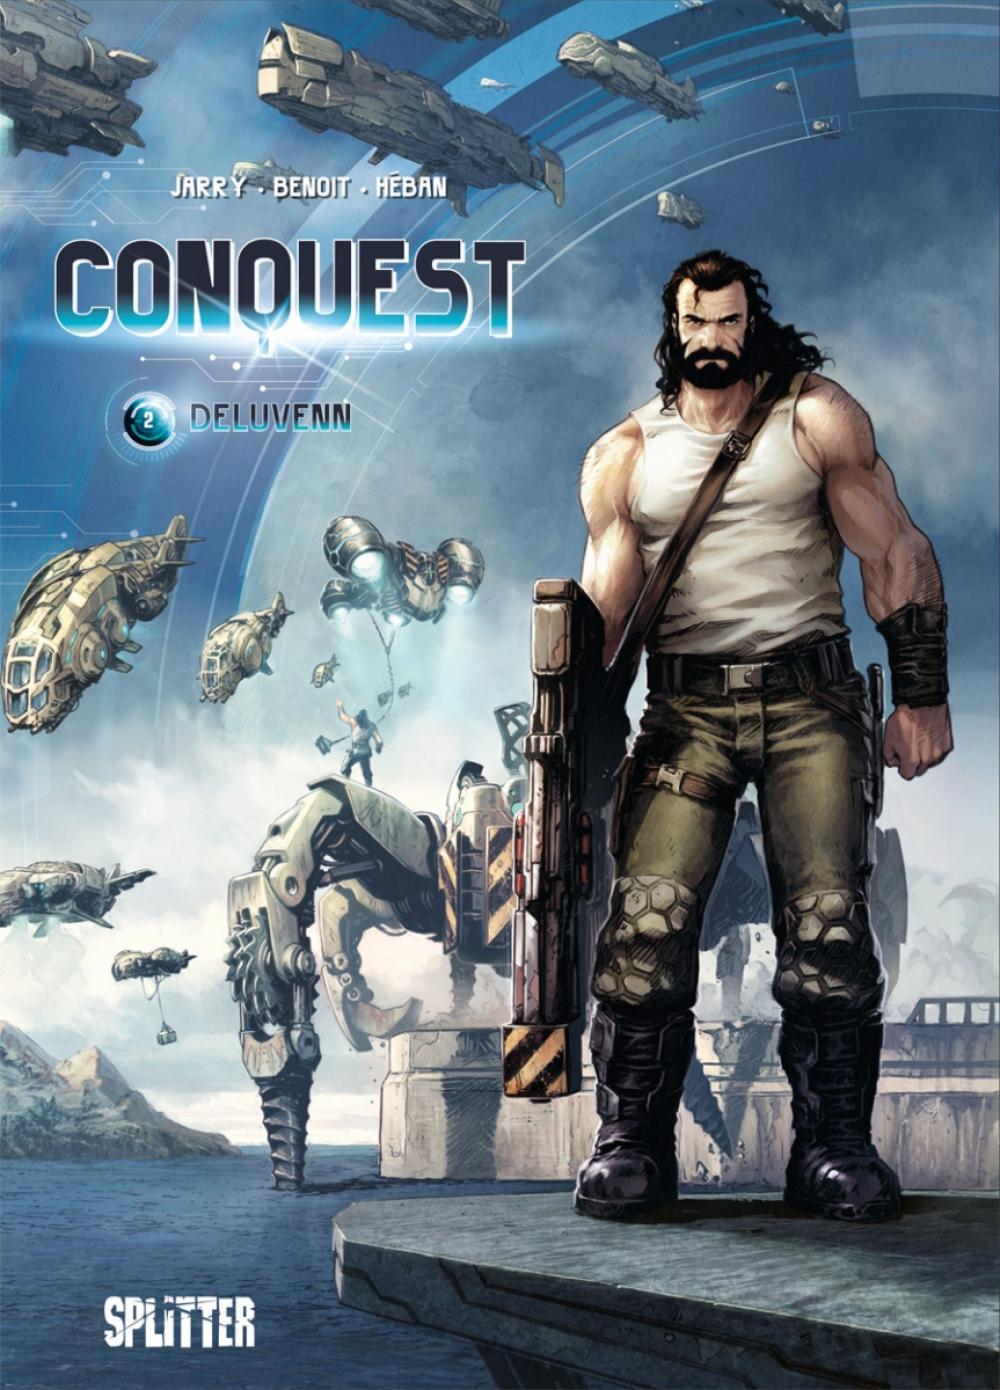 Conquest 2 : Deluvenn